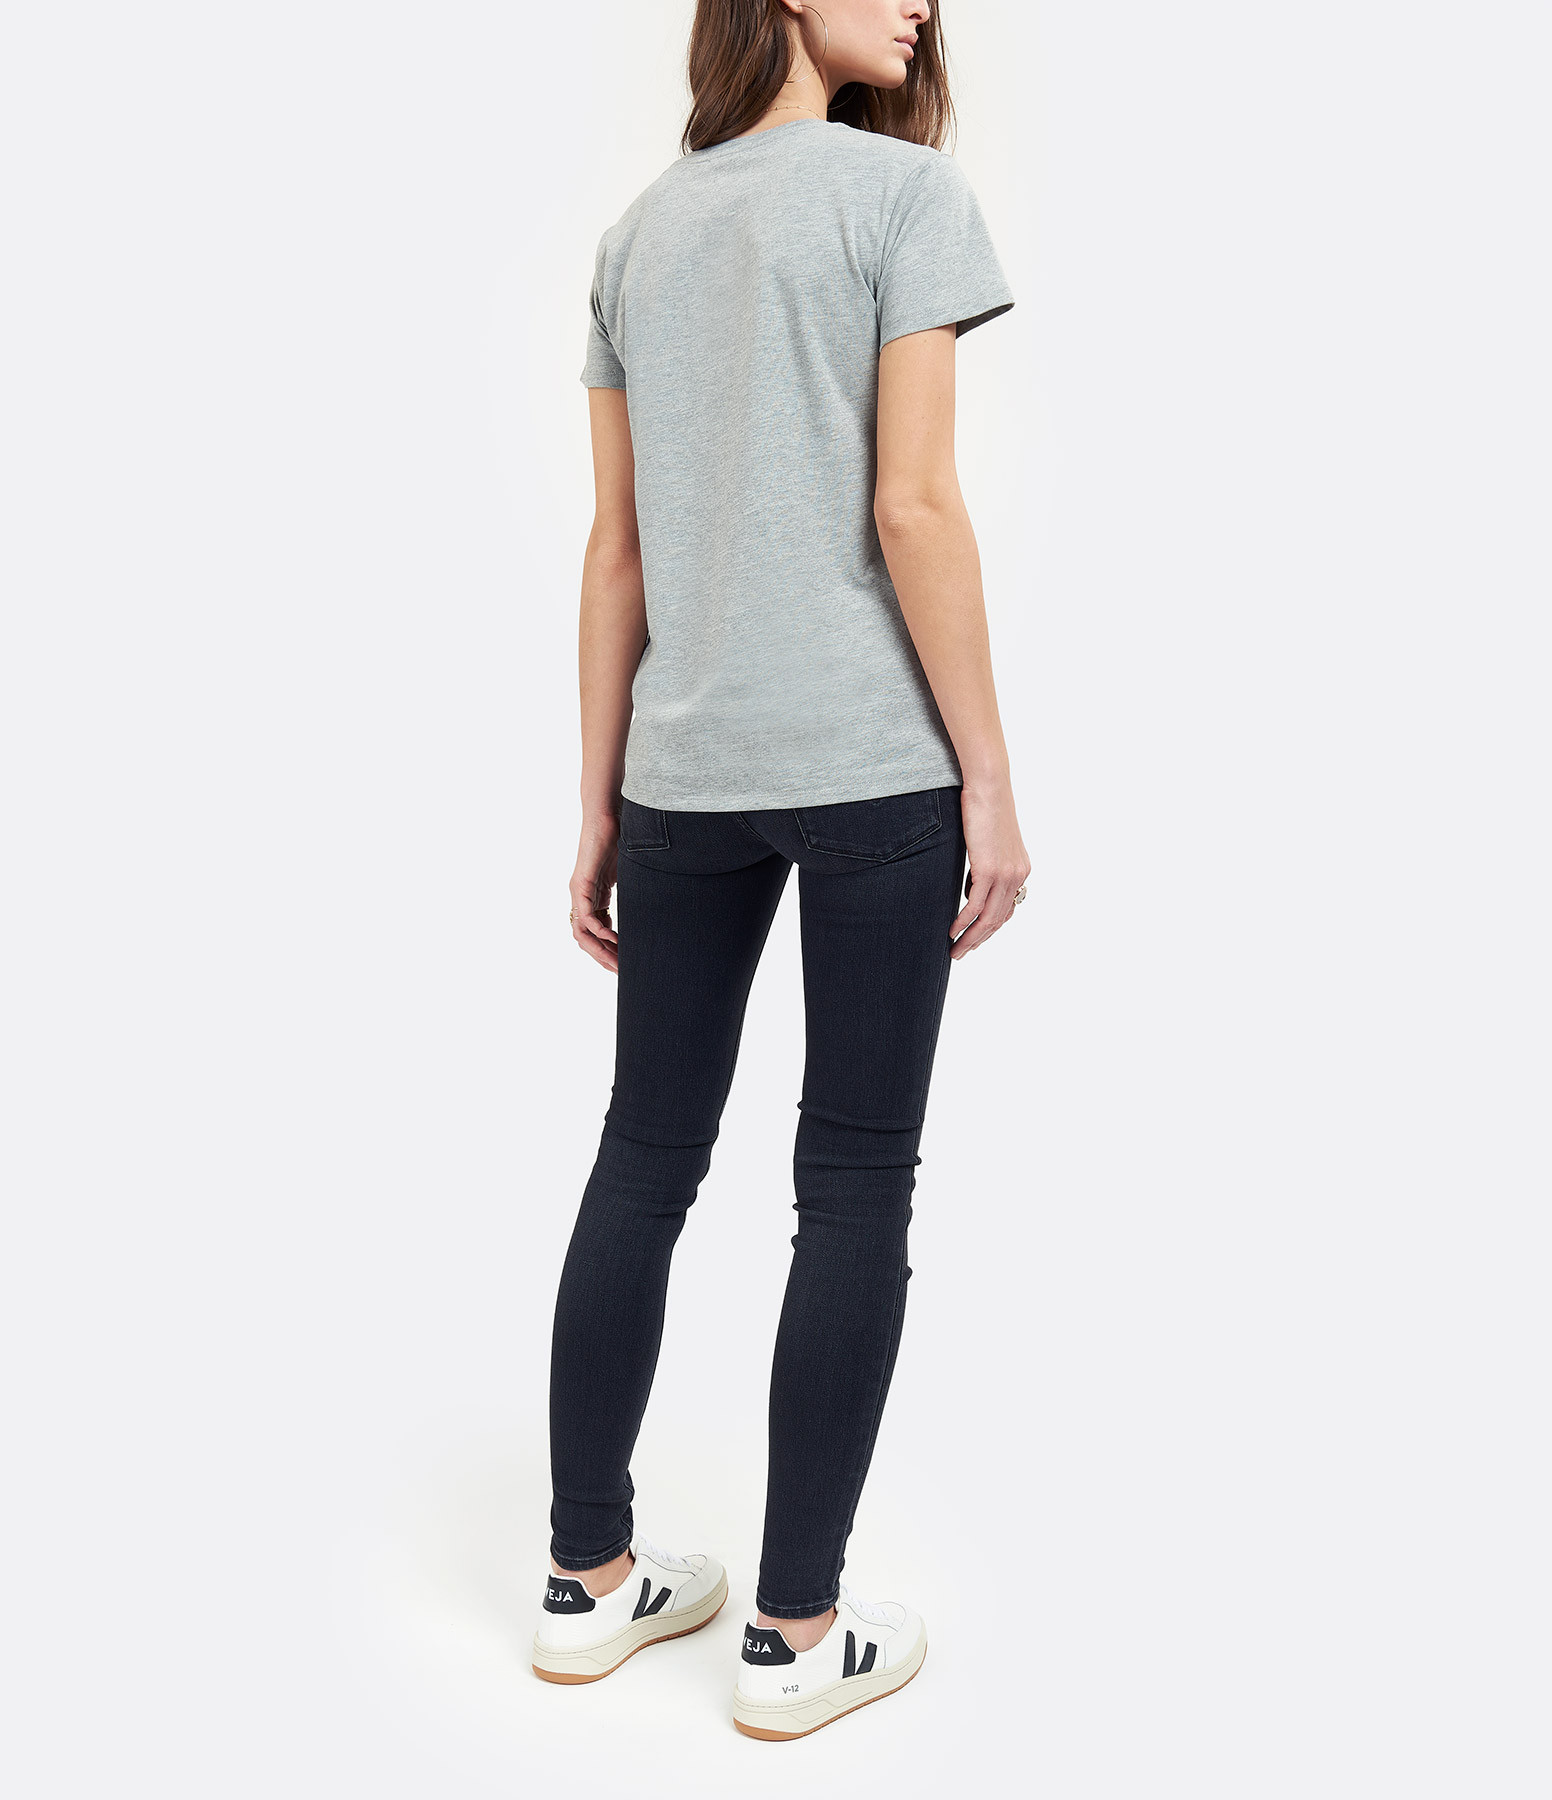 JEANNE VOULAND - Tee-Shirt Devon Venice Gris